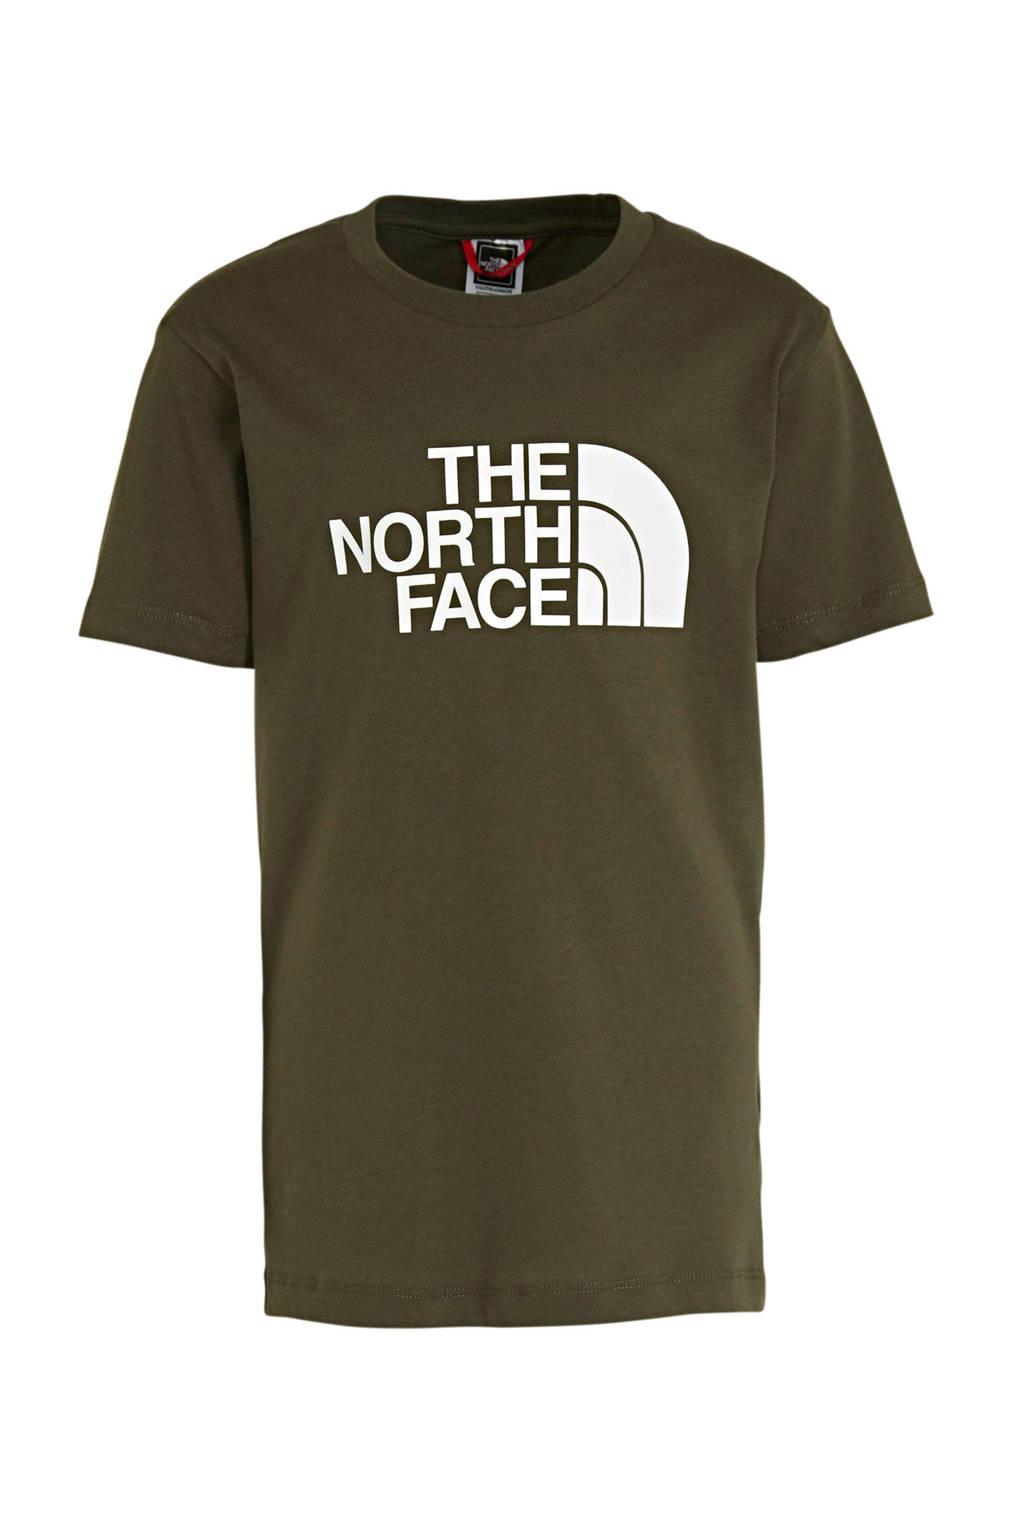 The North Face T-shirt grijs/wit, kaki/wit